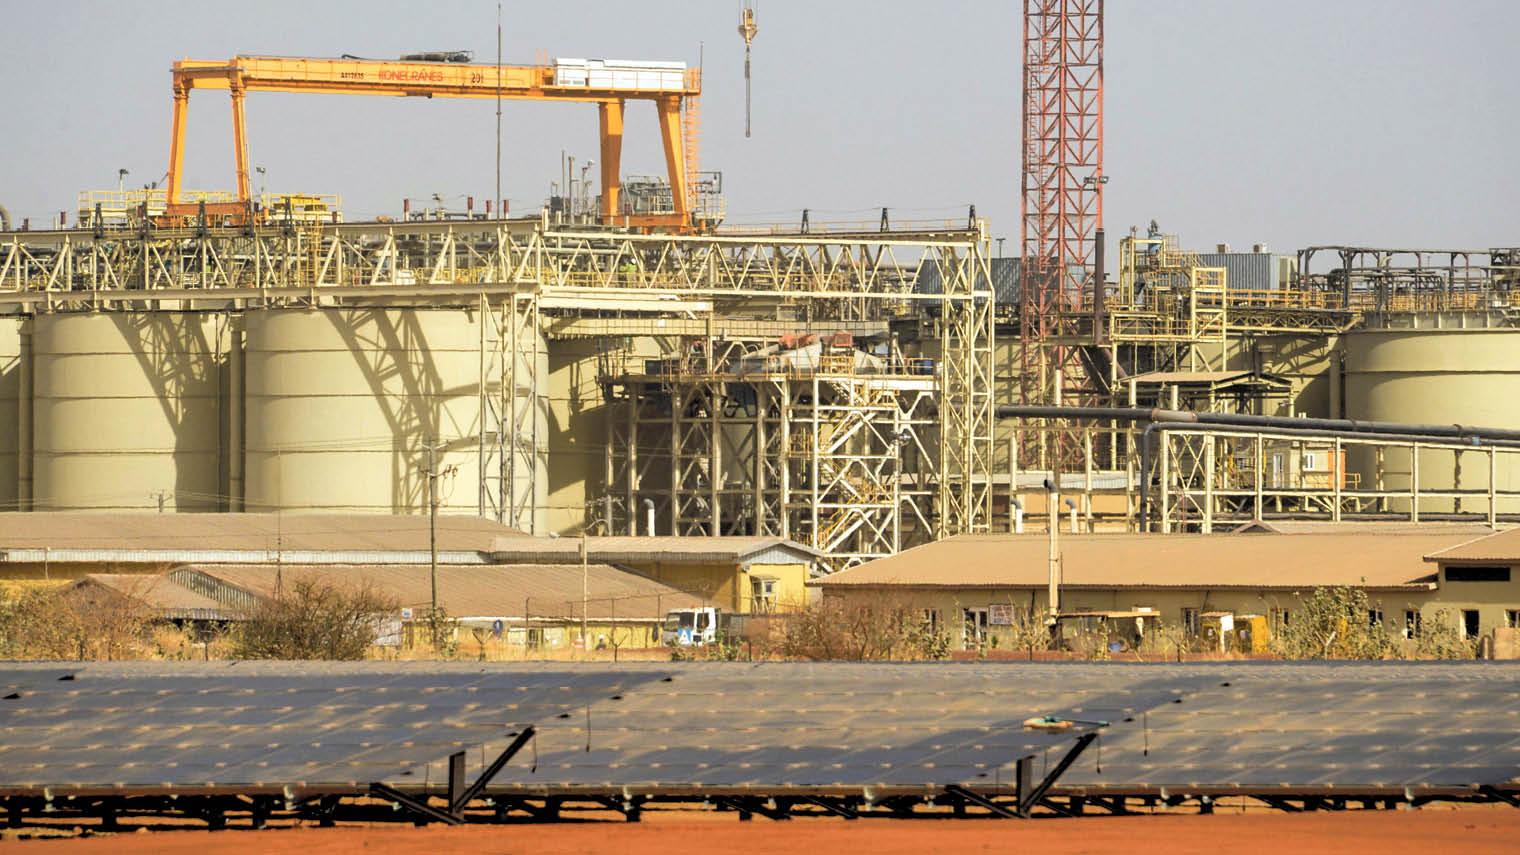 Solar power plant supplying power to IAMGOLD's Essakane gold mine near Dori, Bukina Faso operations